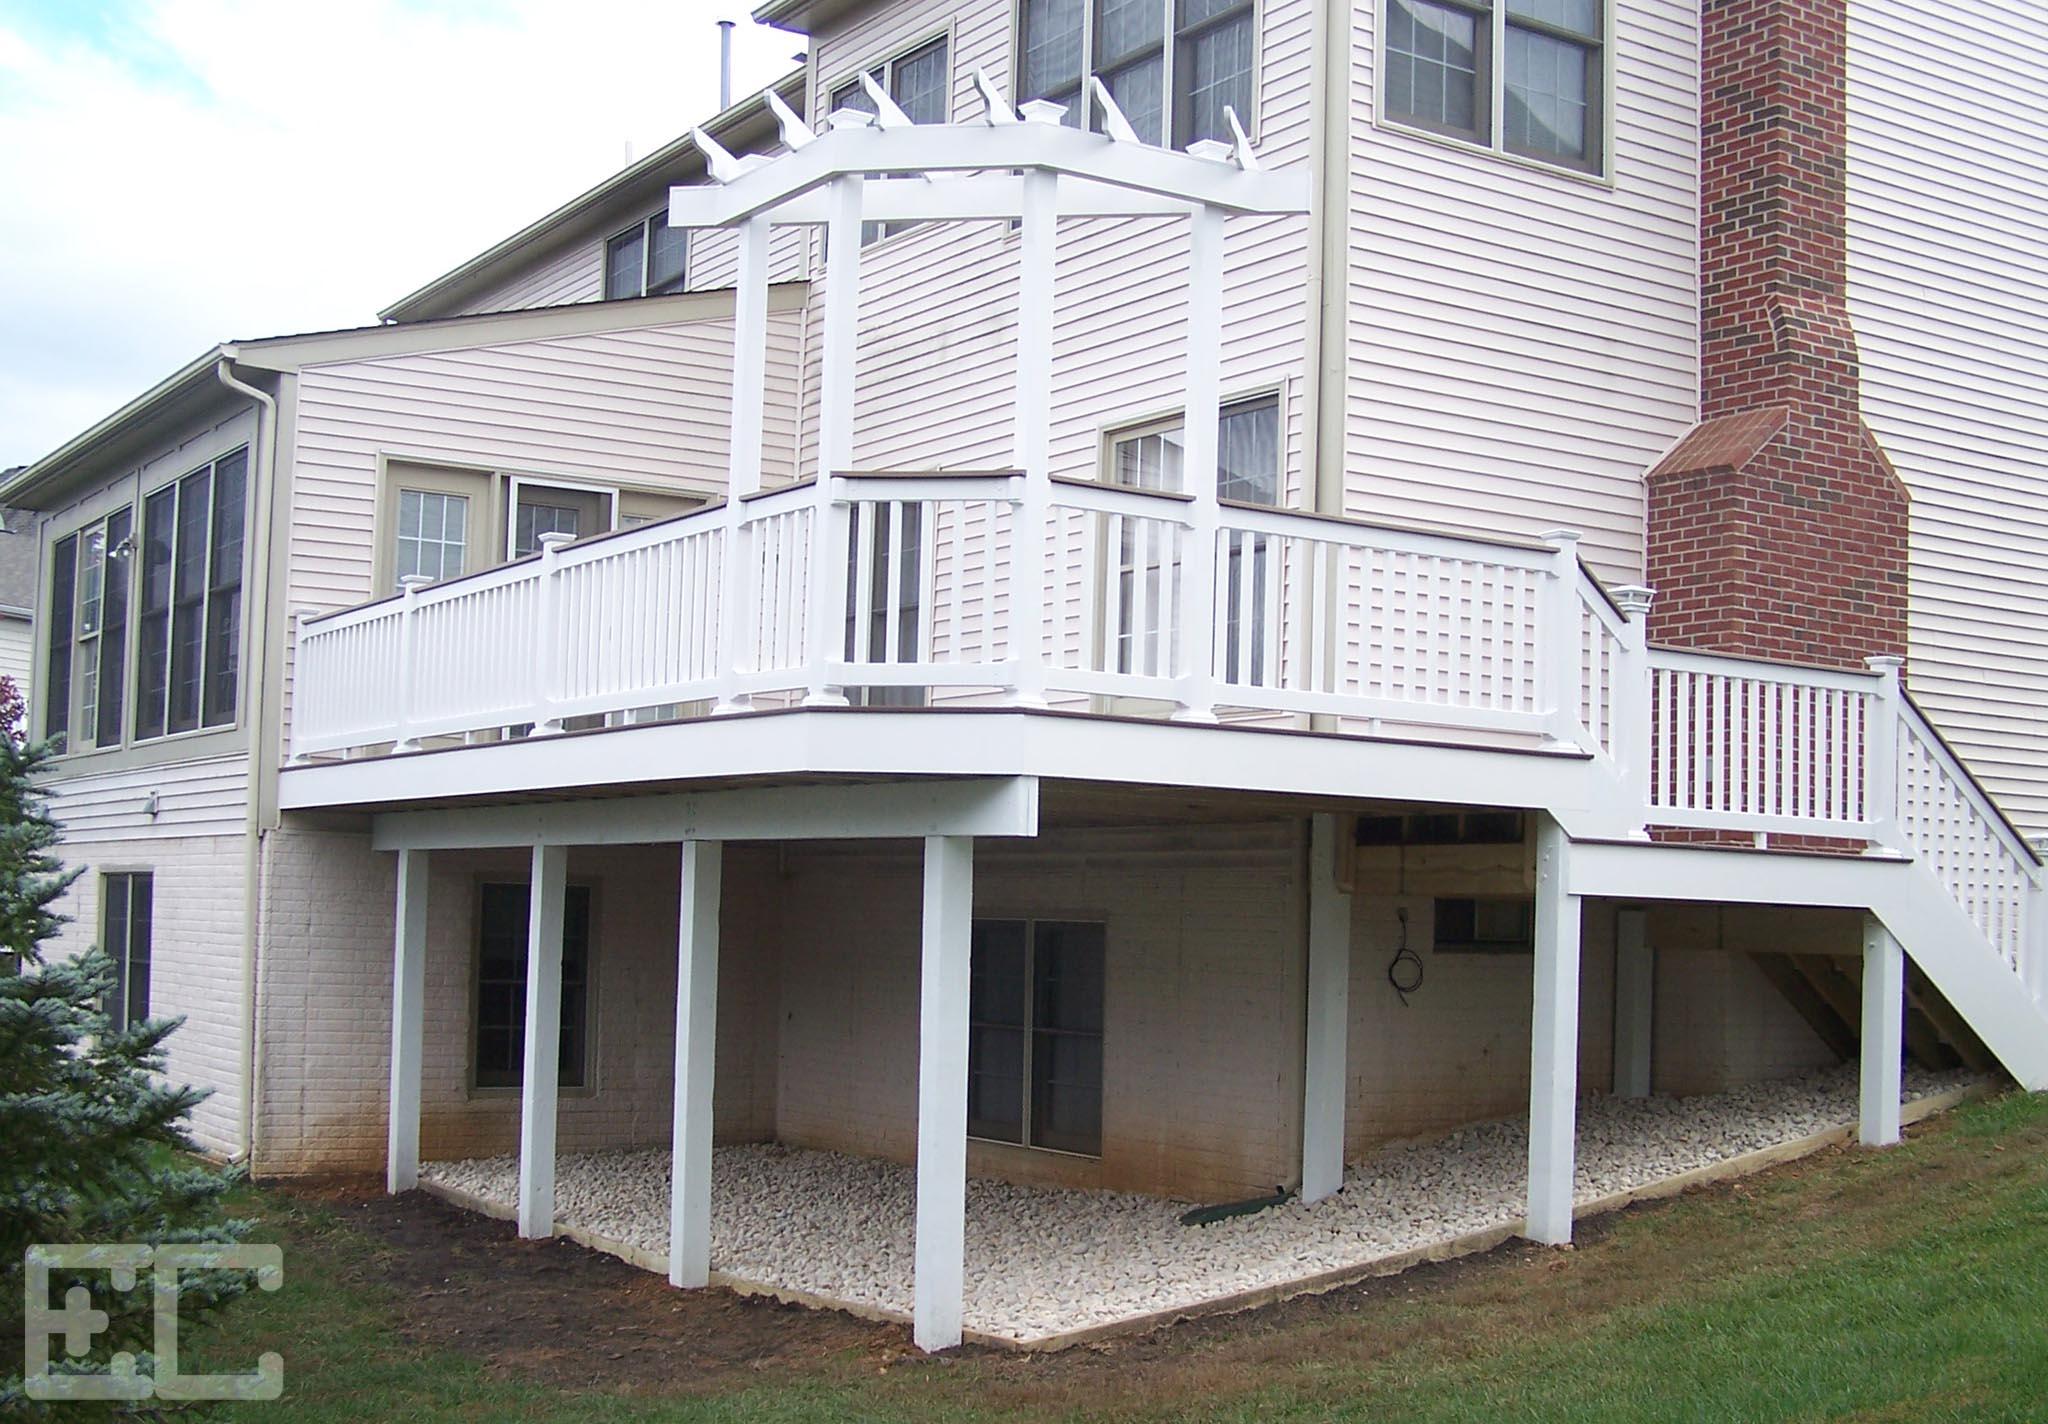 Upper Deck with Trellis